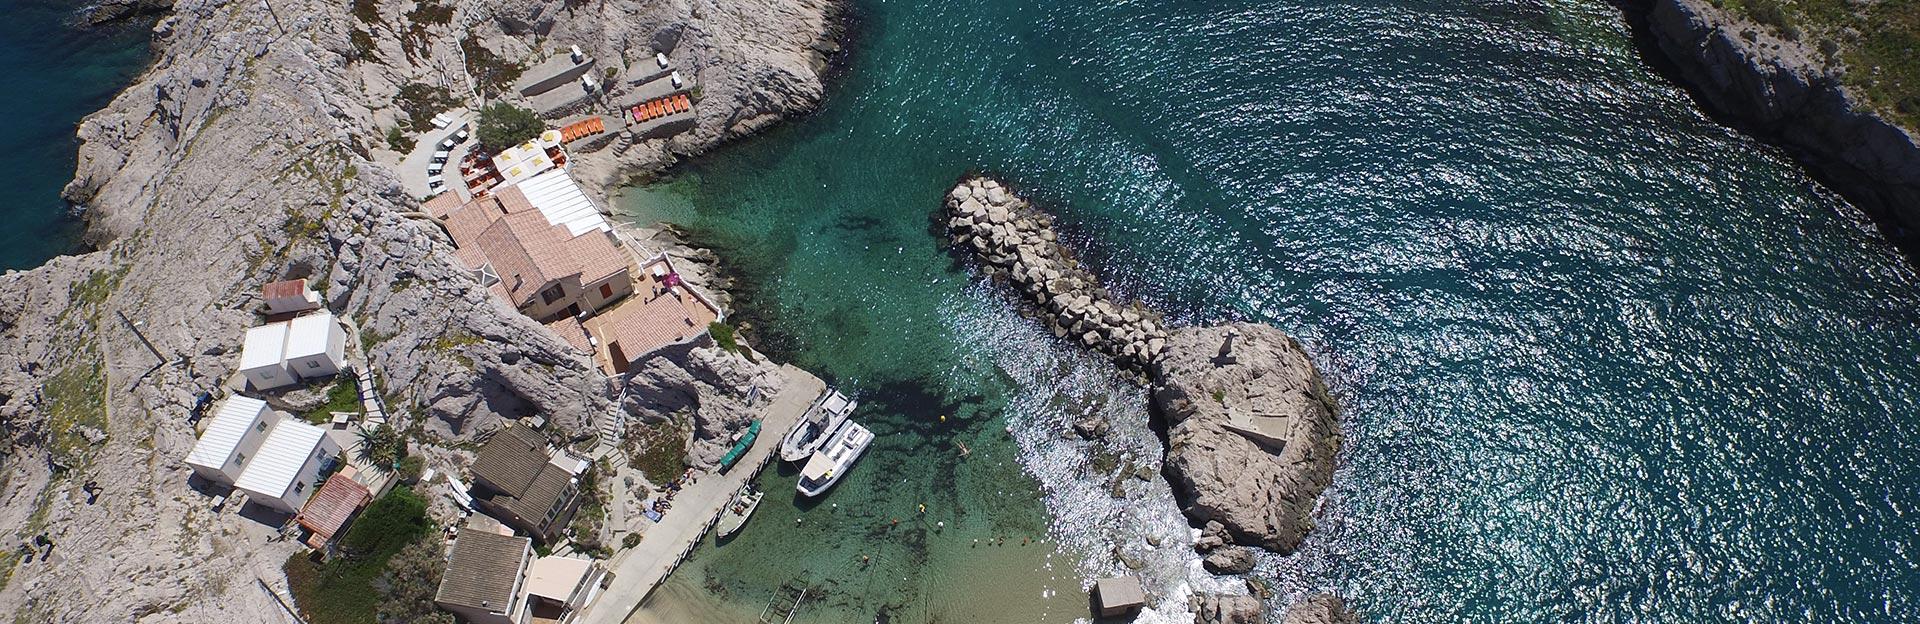 restaurant crustacés en bord de mer à marseille